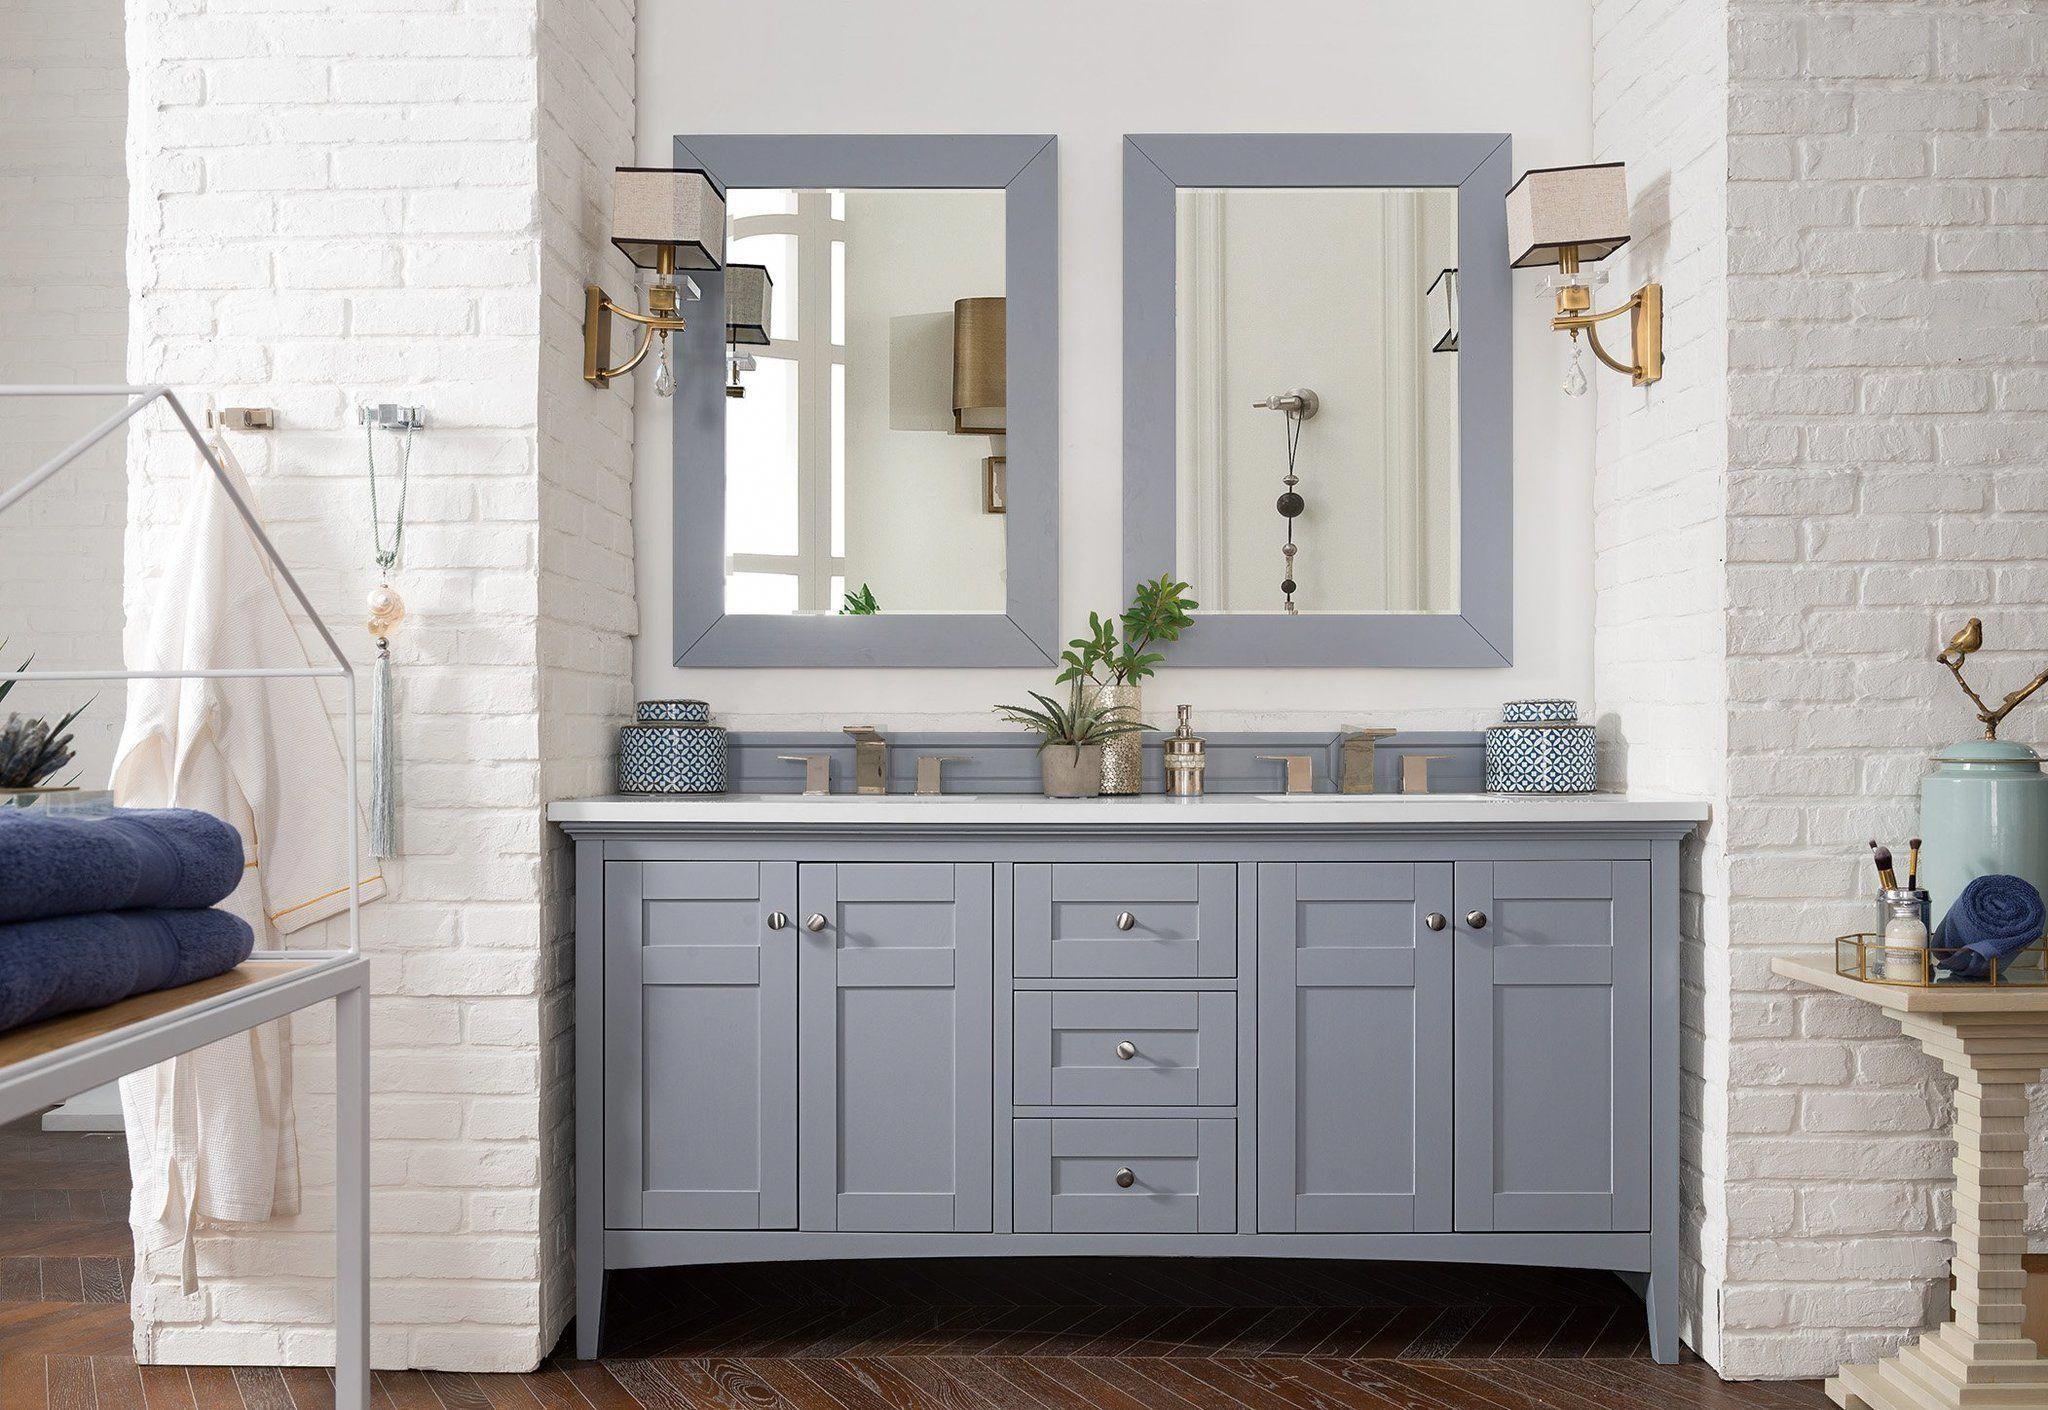 Palisades 72 Double Bathroom Vanity Double Bathroom Vanity James Martin Vanity Graybathroom Grey Bathroom Vanity Bathroom Vanity Vanity [ 1410 x 2048 Pixel ]